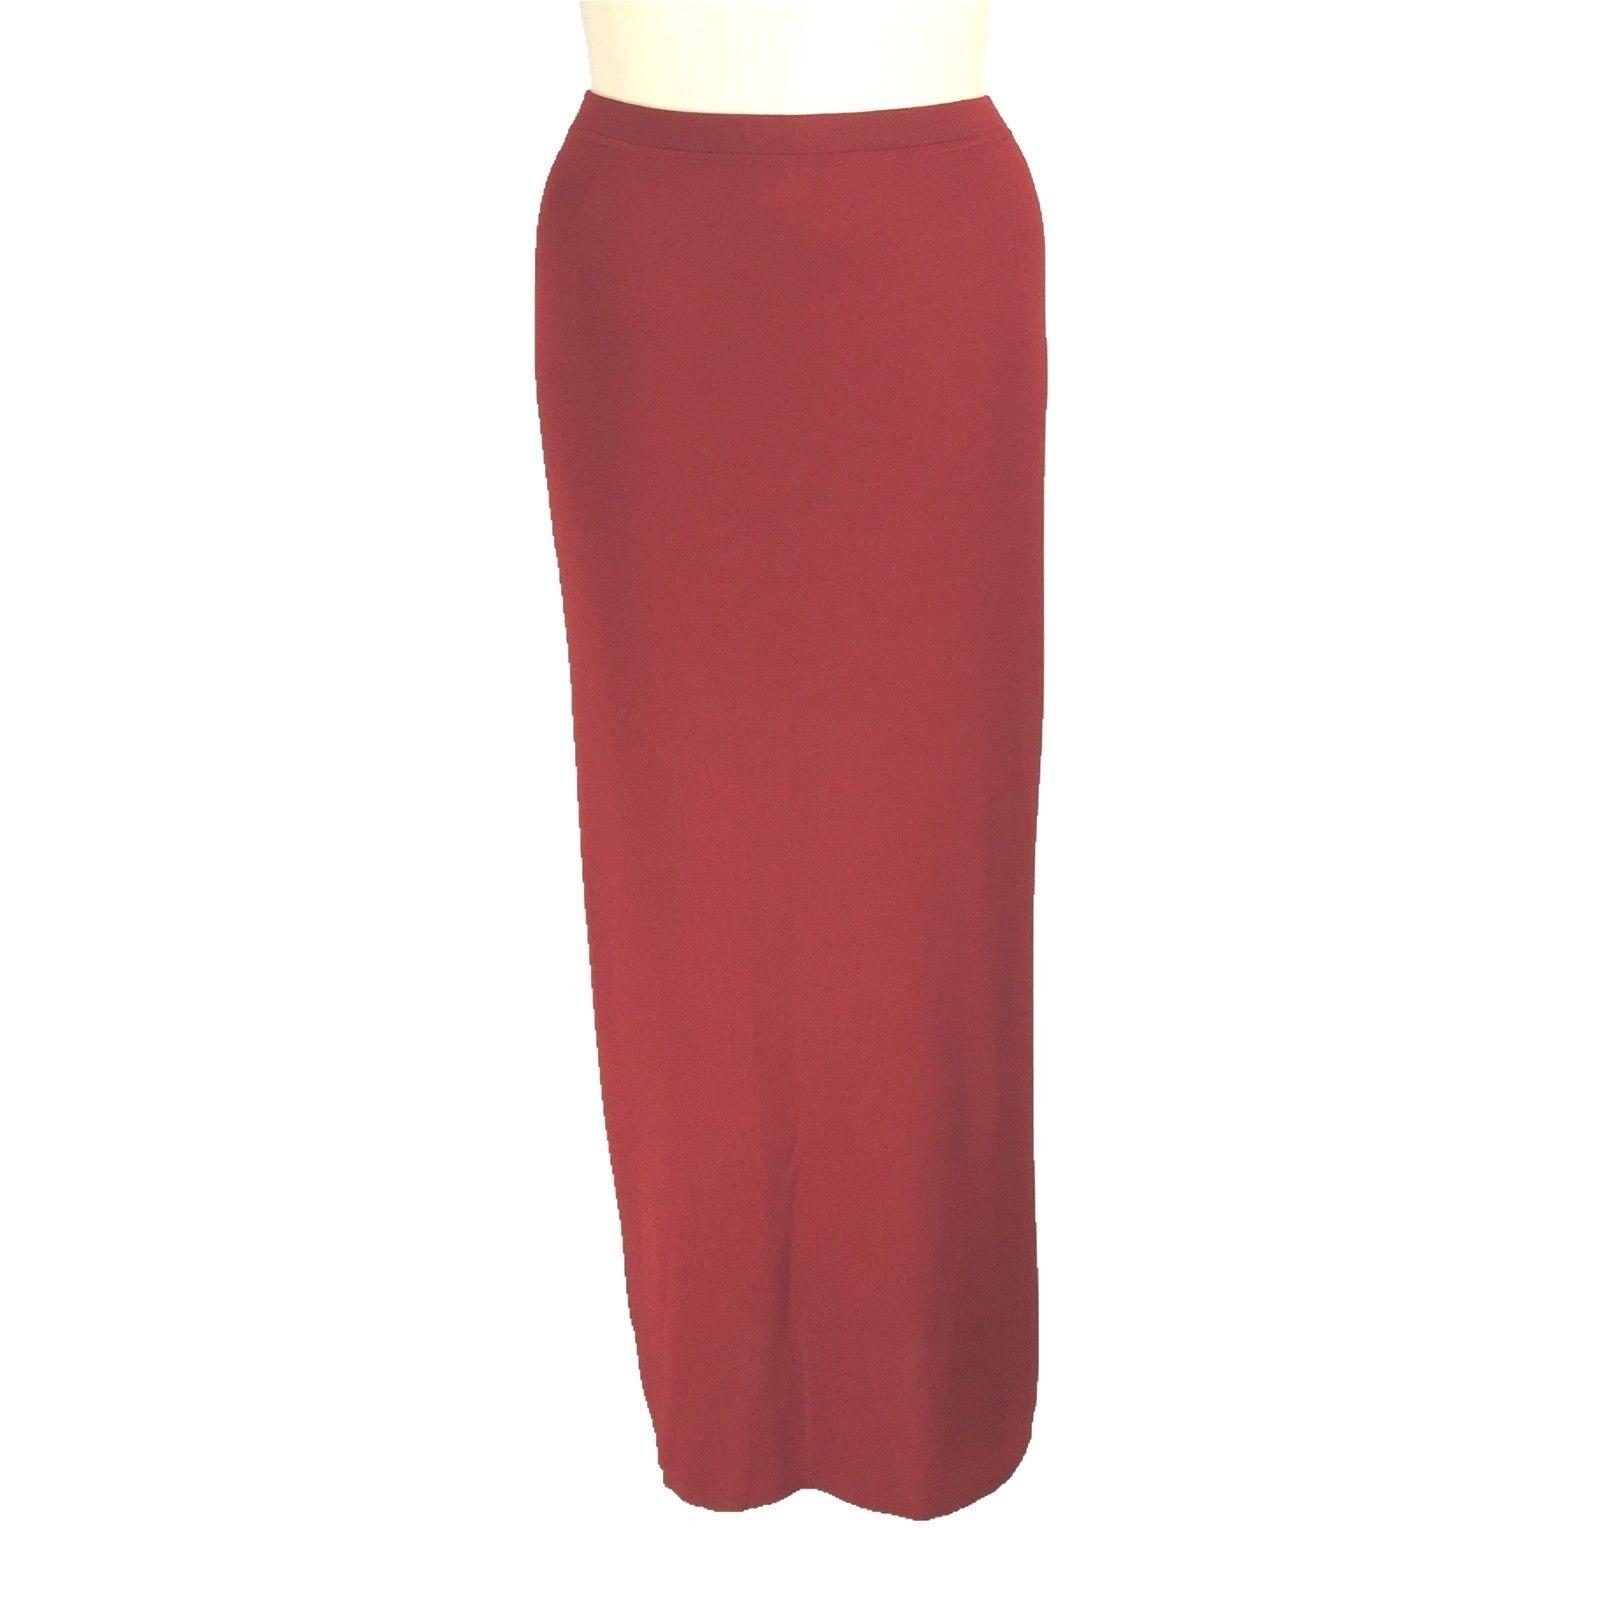 Plein Air XL Knit Dark Red Pencil Skirt Maxi Long Travel Side Slit Washable LN